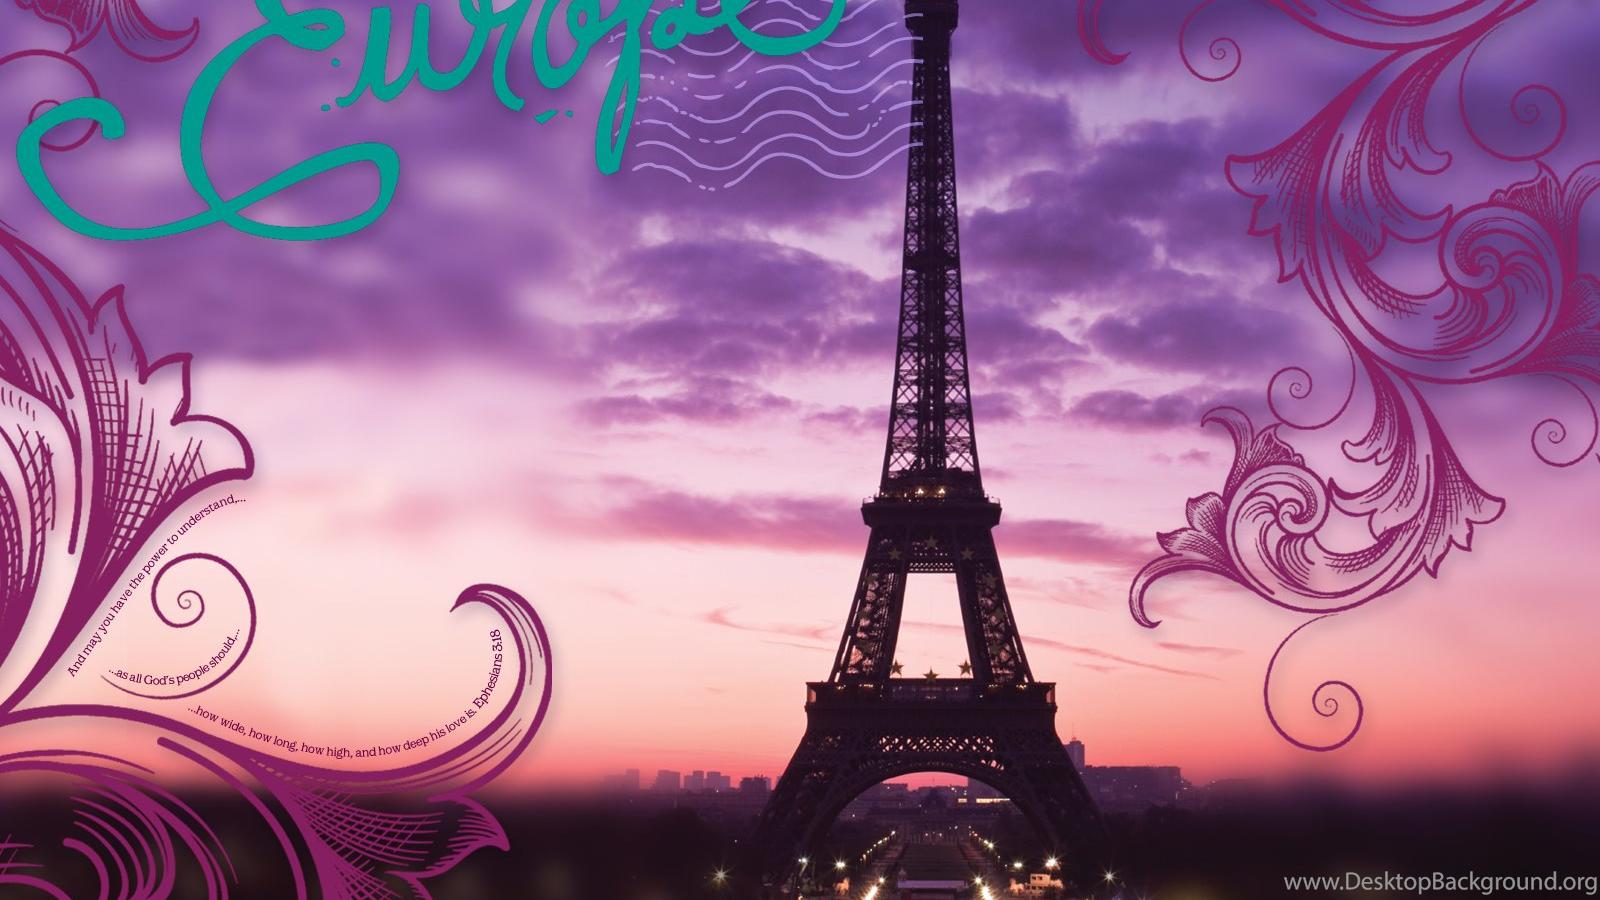 Pink Eiffel Tower Wallpapers Desktop Backgrounds Desktop